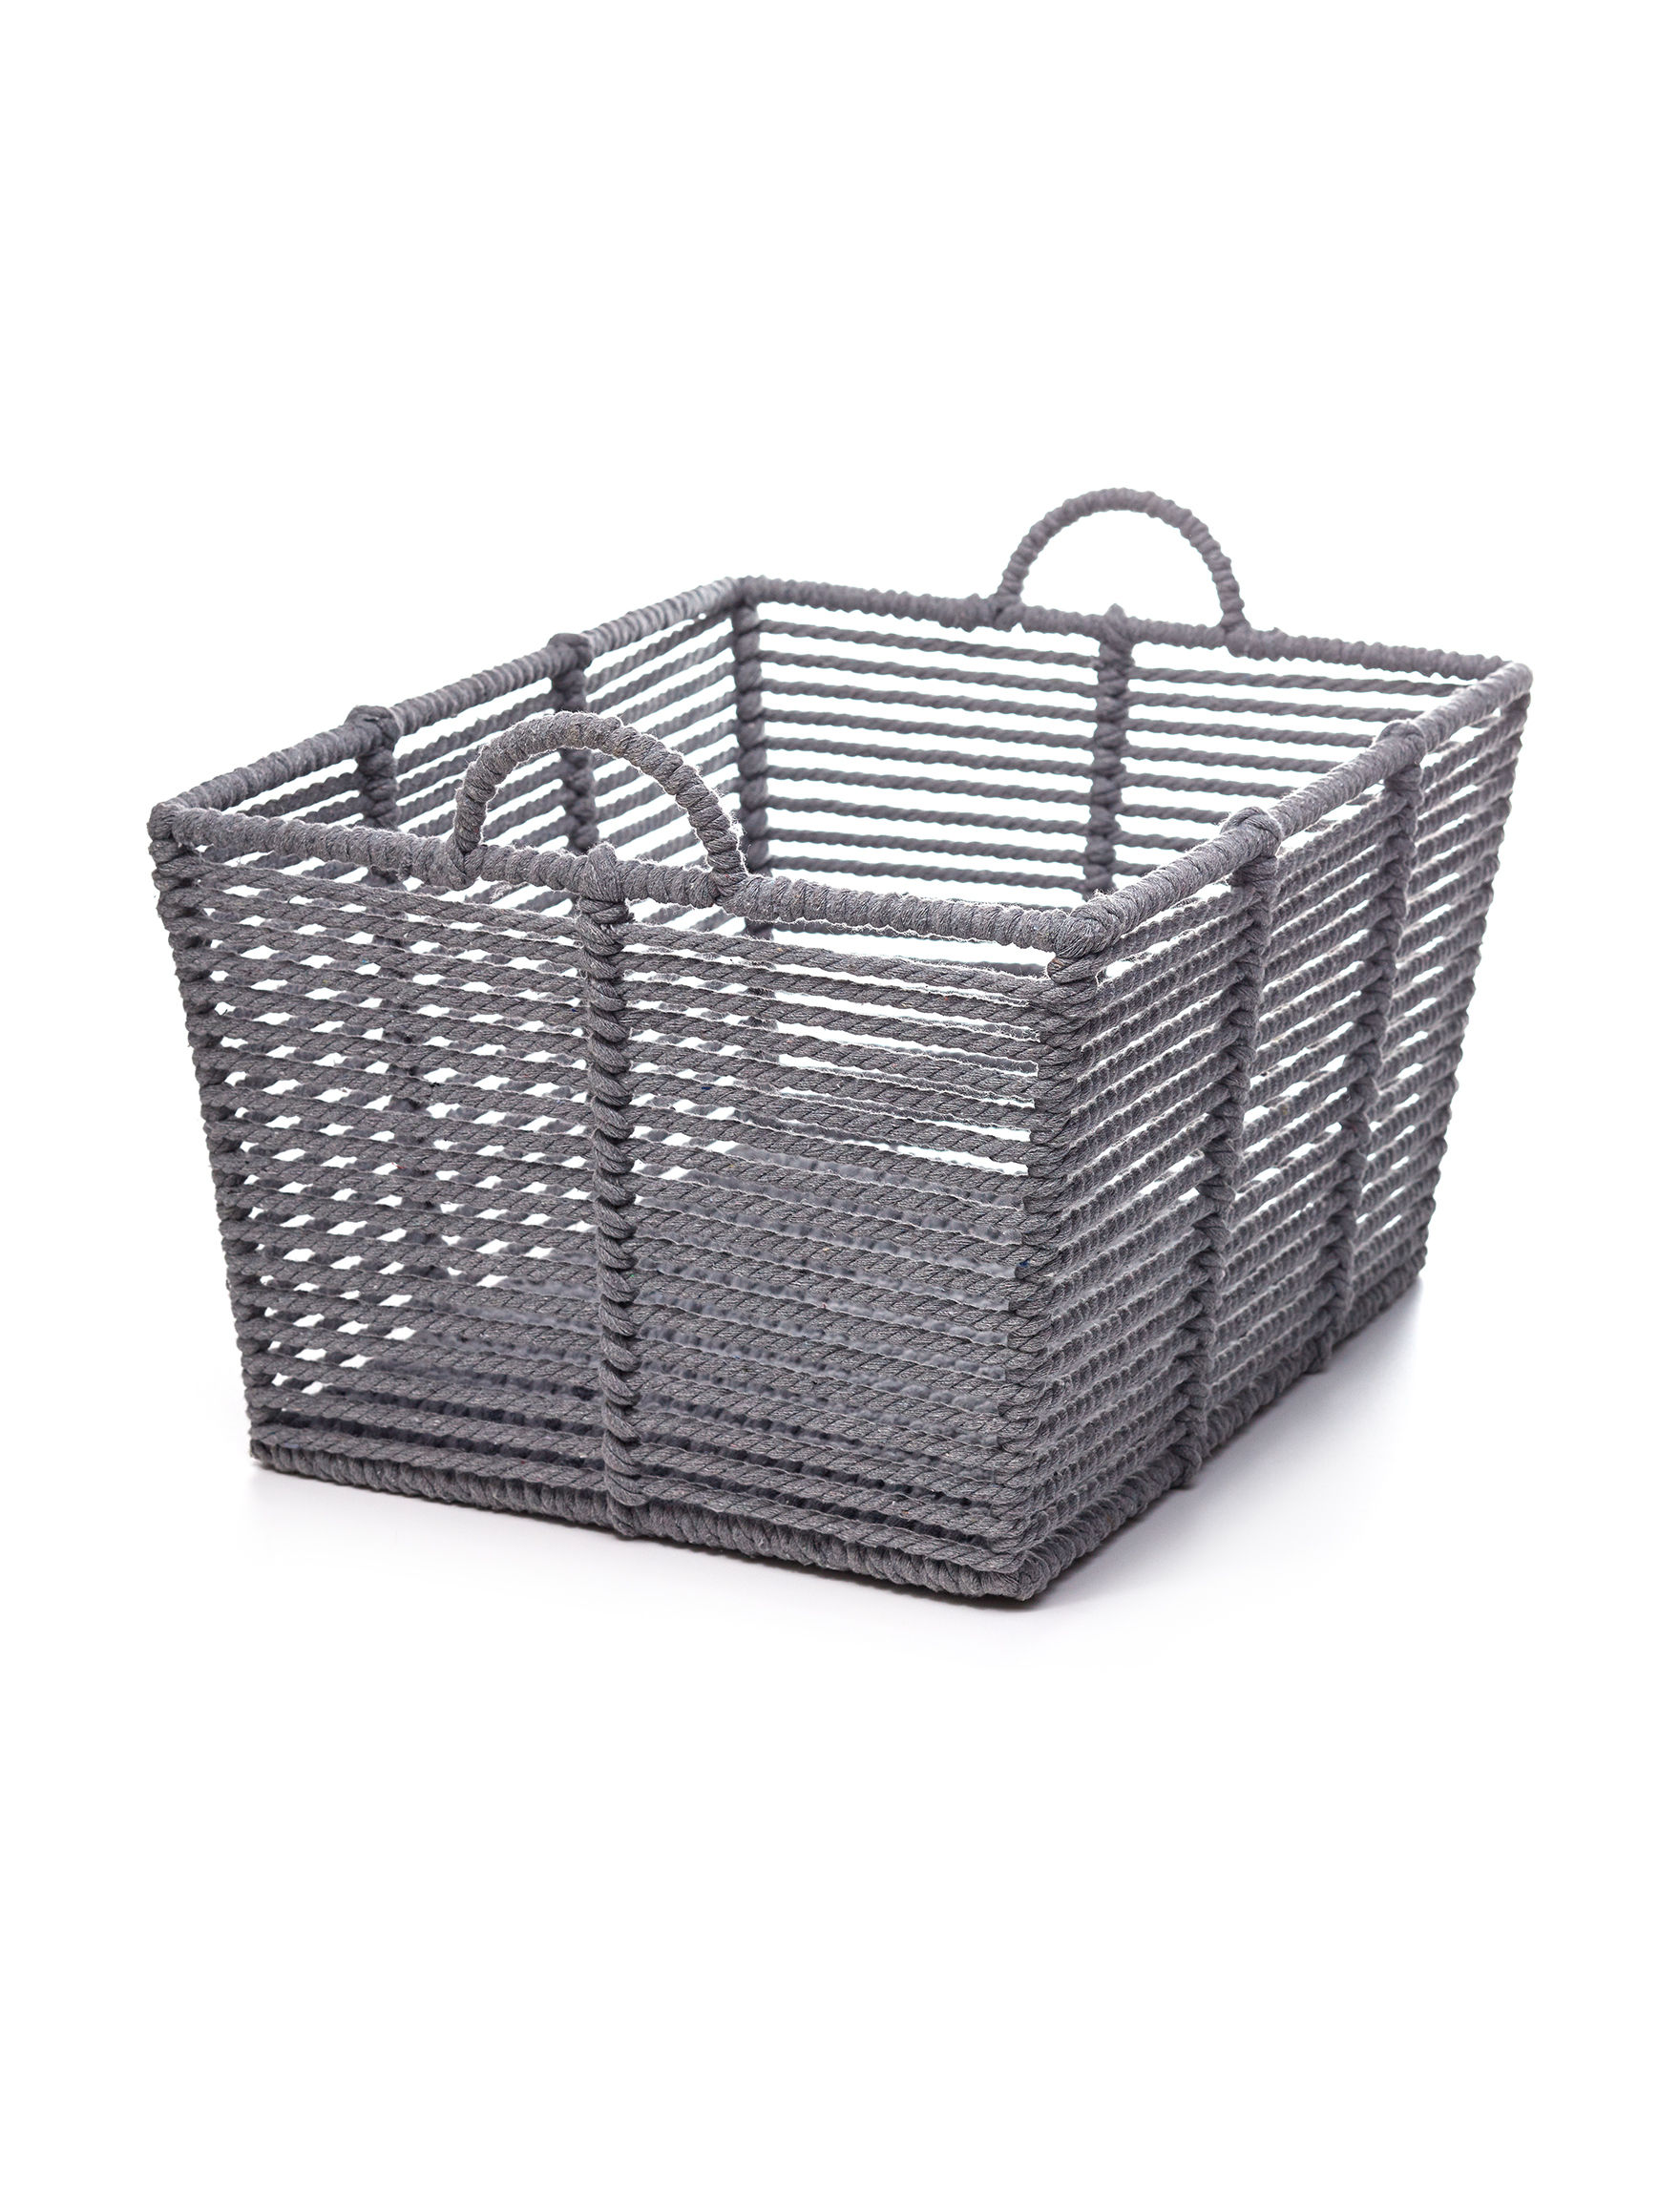 Enchante Light Grey Baskets Home Accents Storage & Organization